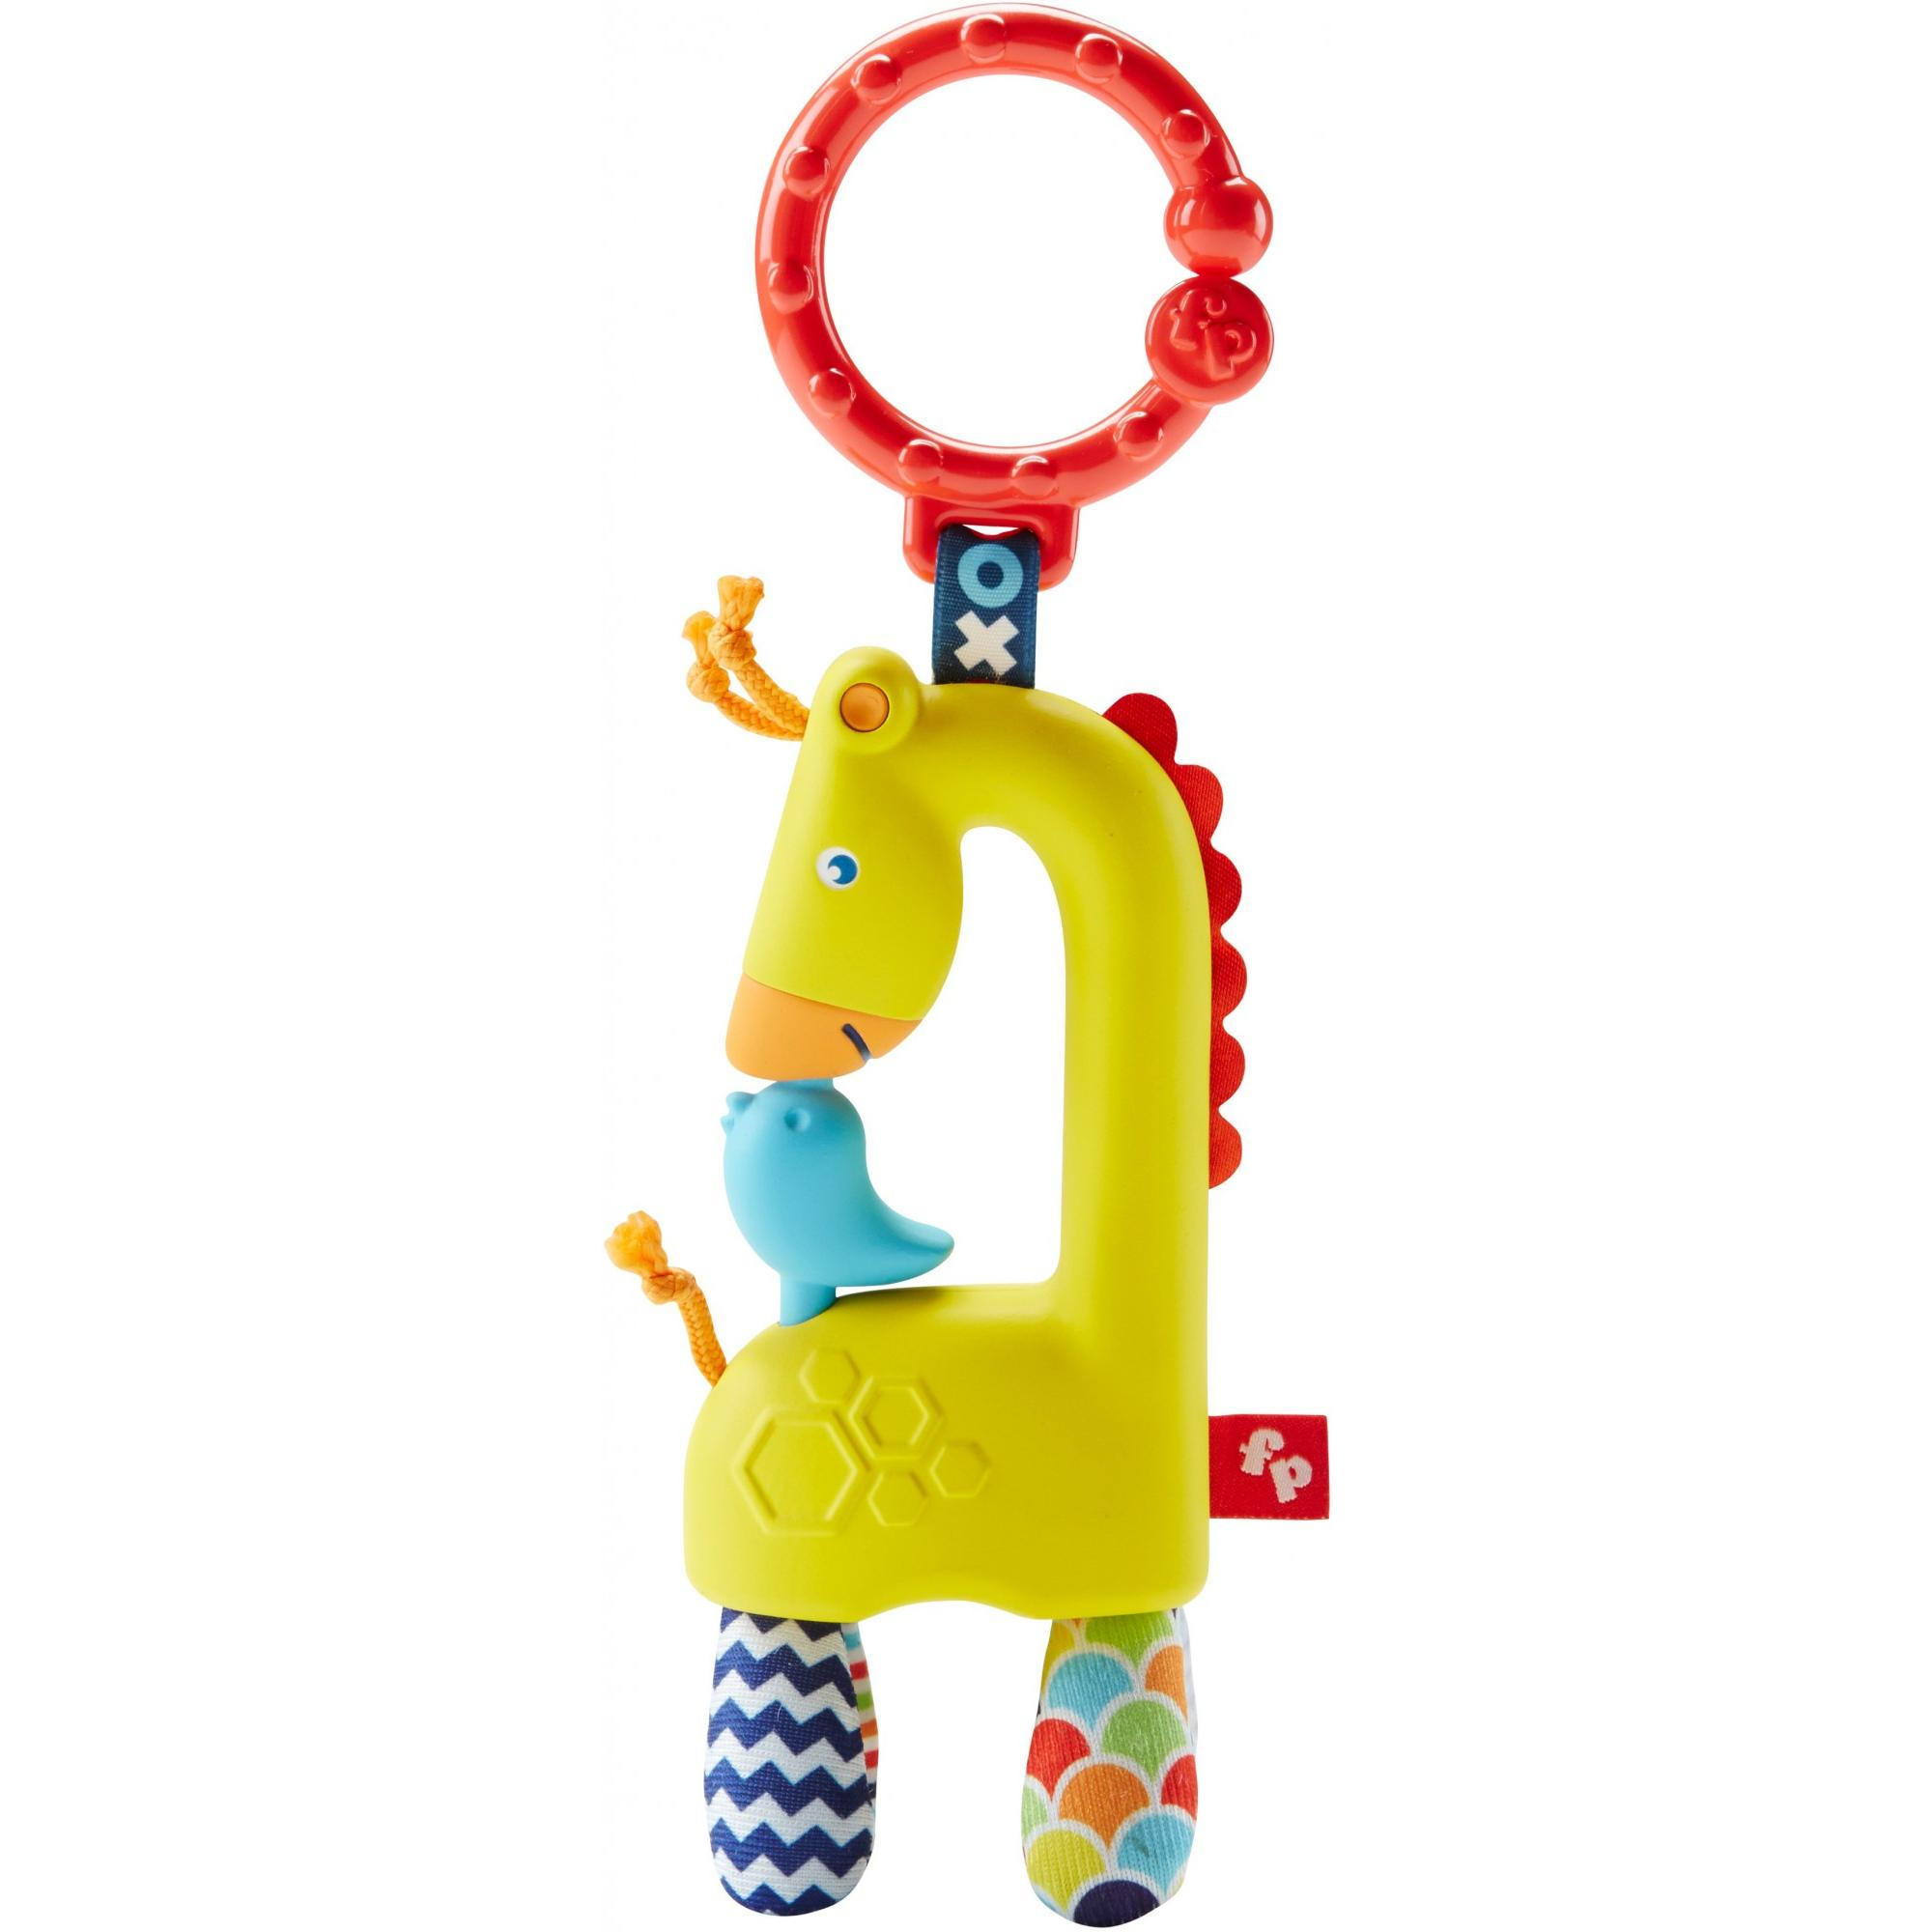 Fisher-Price Giraffe Spinner